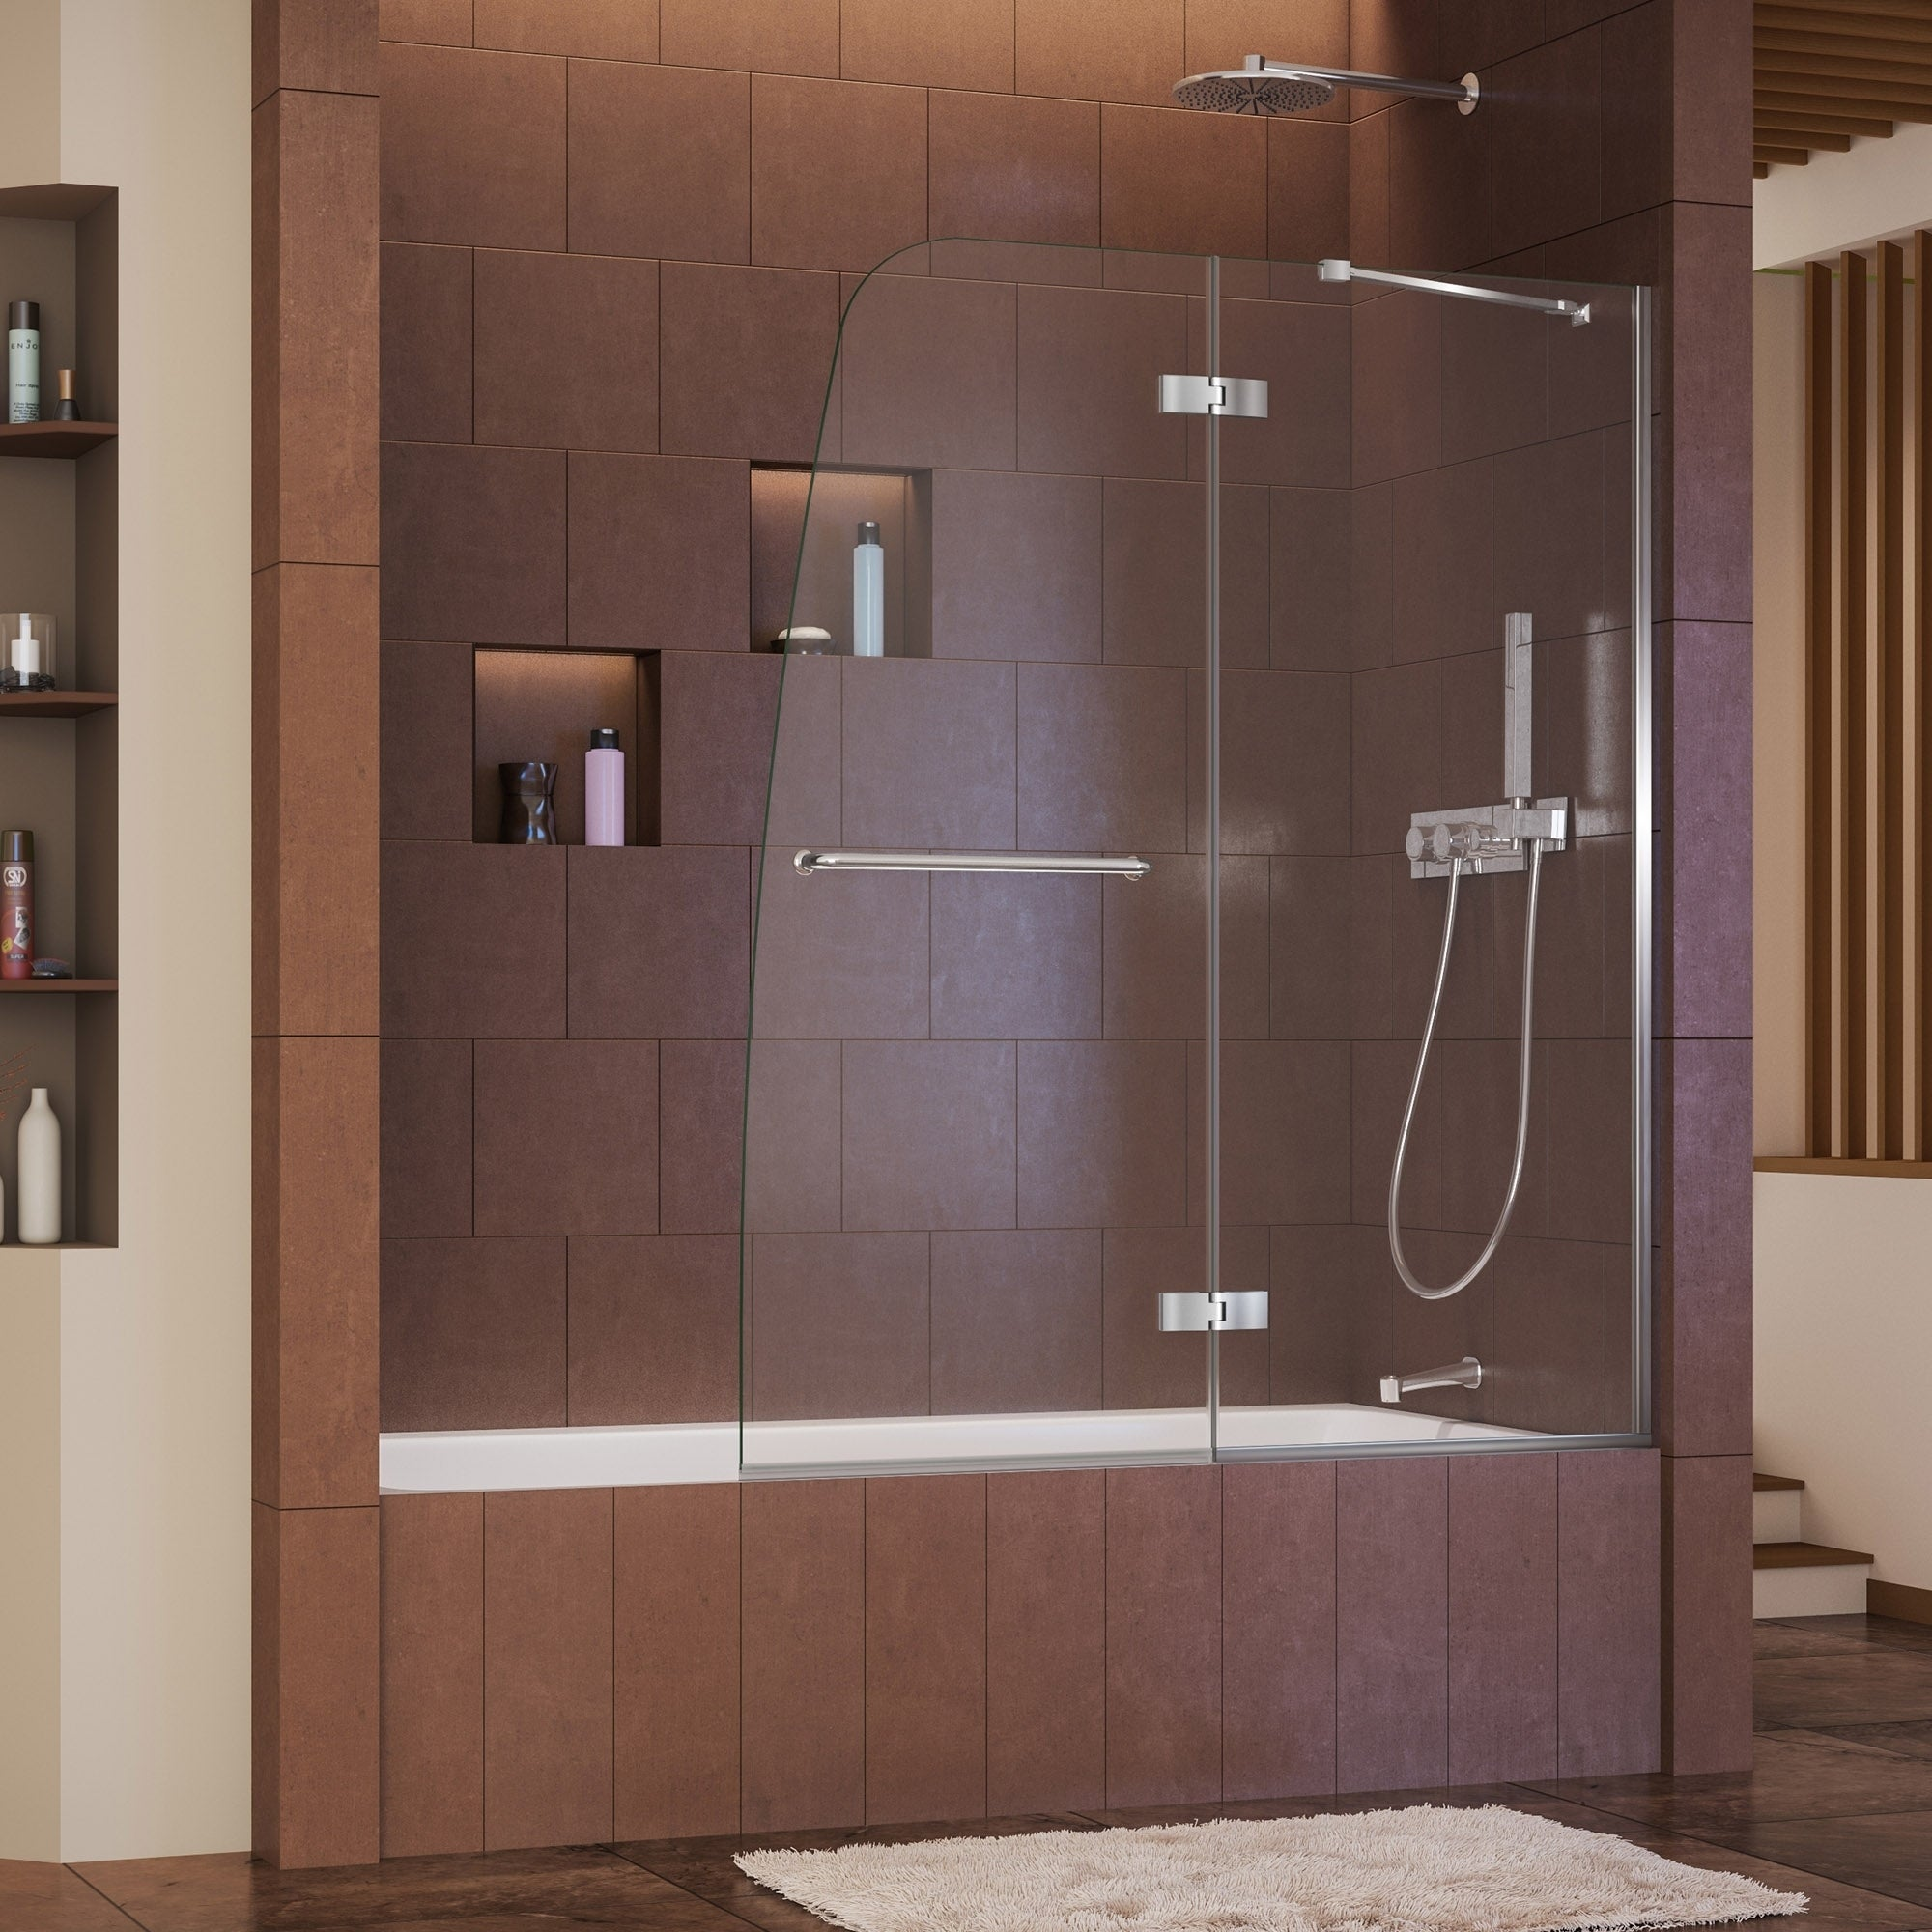 Dreamline Aqua Ultra 48 in. Frameless Hinged Tub Door (Br...